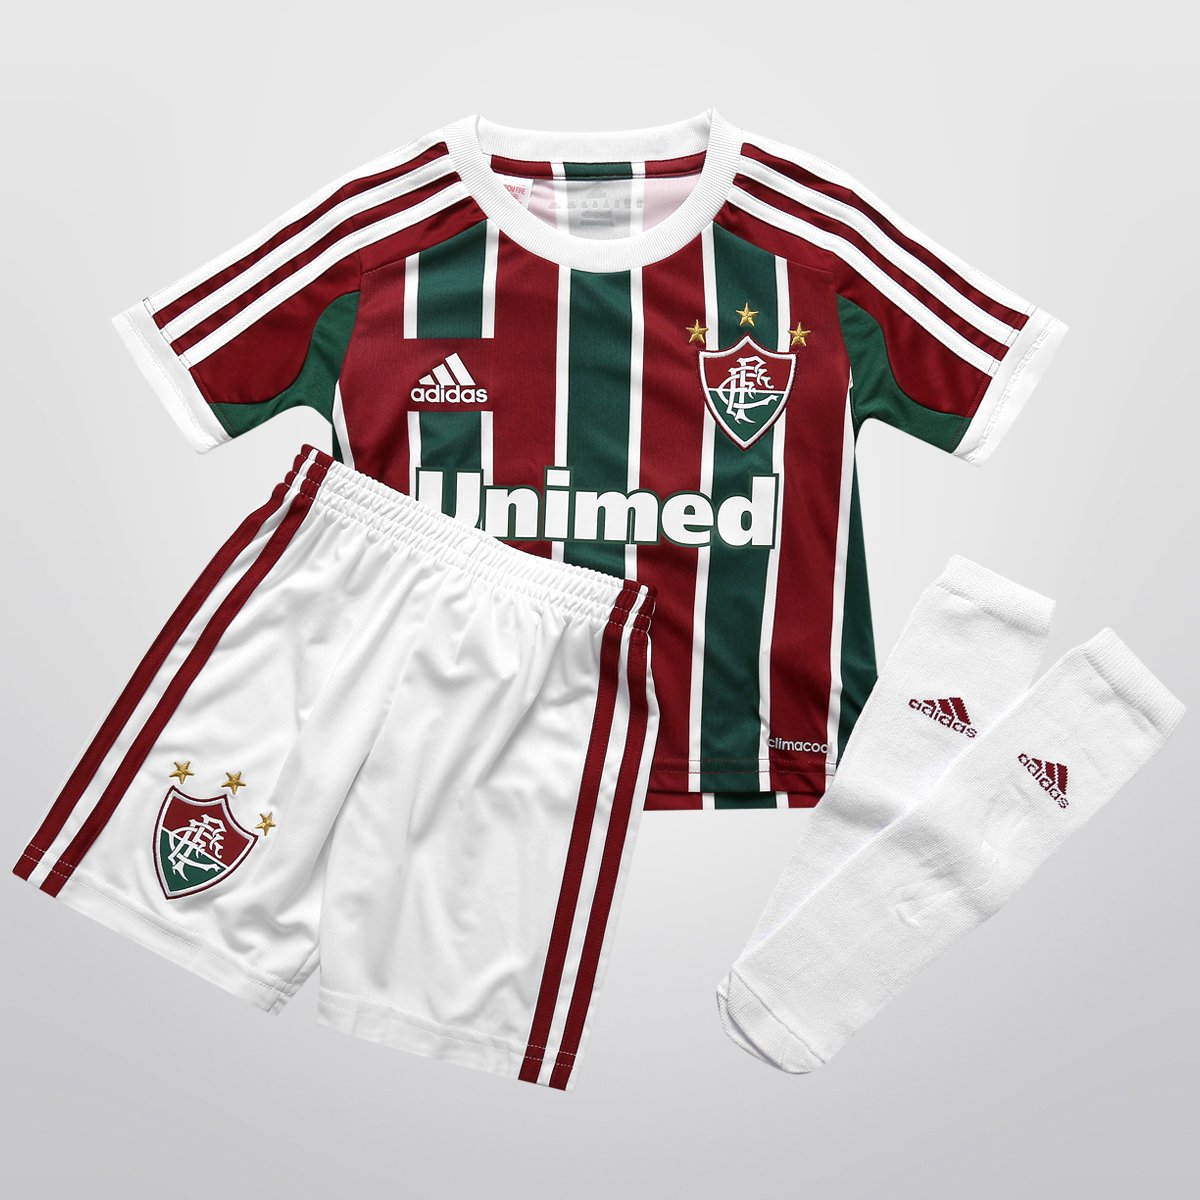 4c7f6e2103676 Kit Adidas Fluminense I 13 14 s nº Infantil - Compre Agora